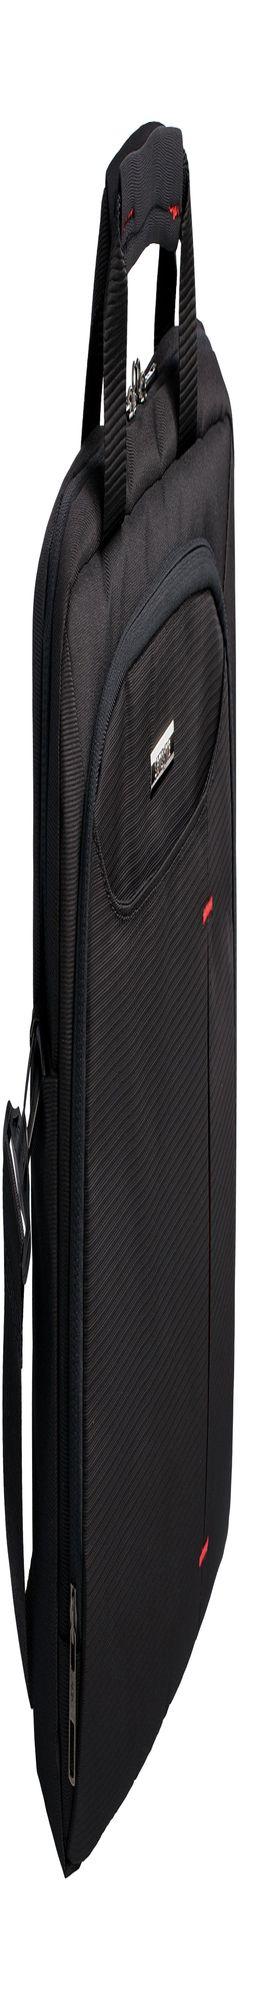 Сумка для ноутбука GuardIT S, черная фото